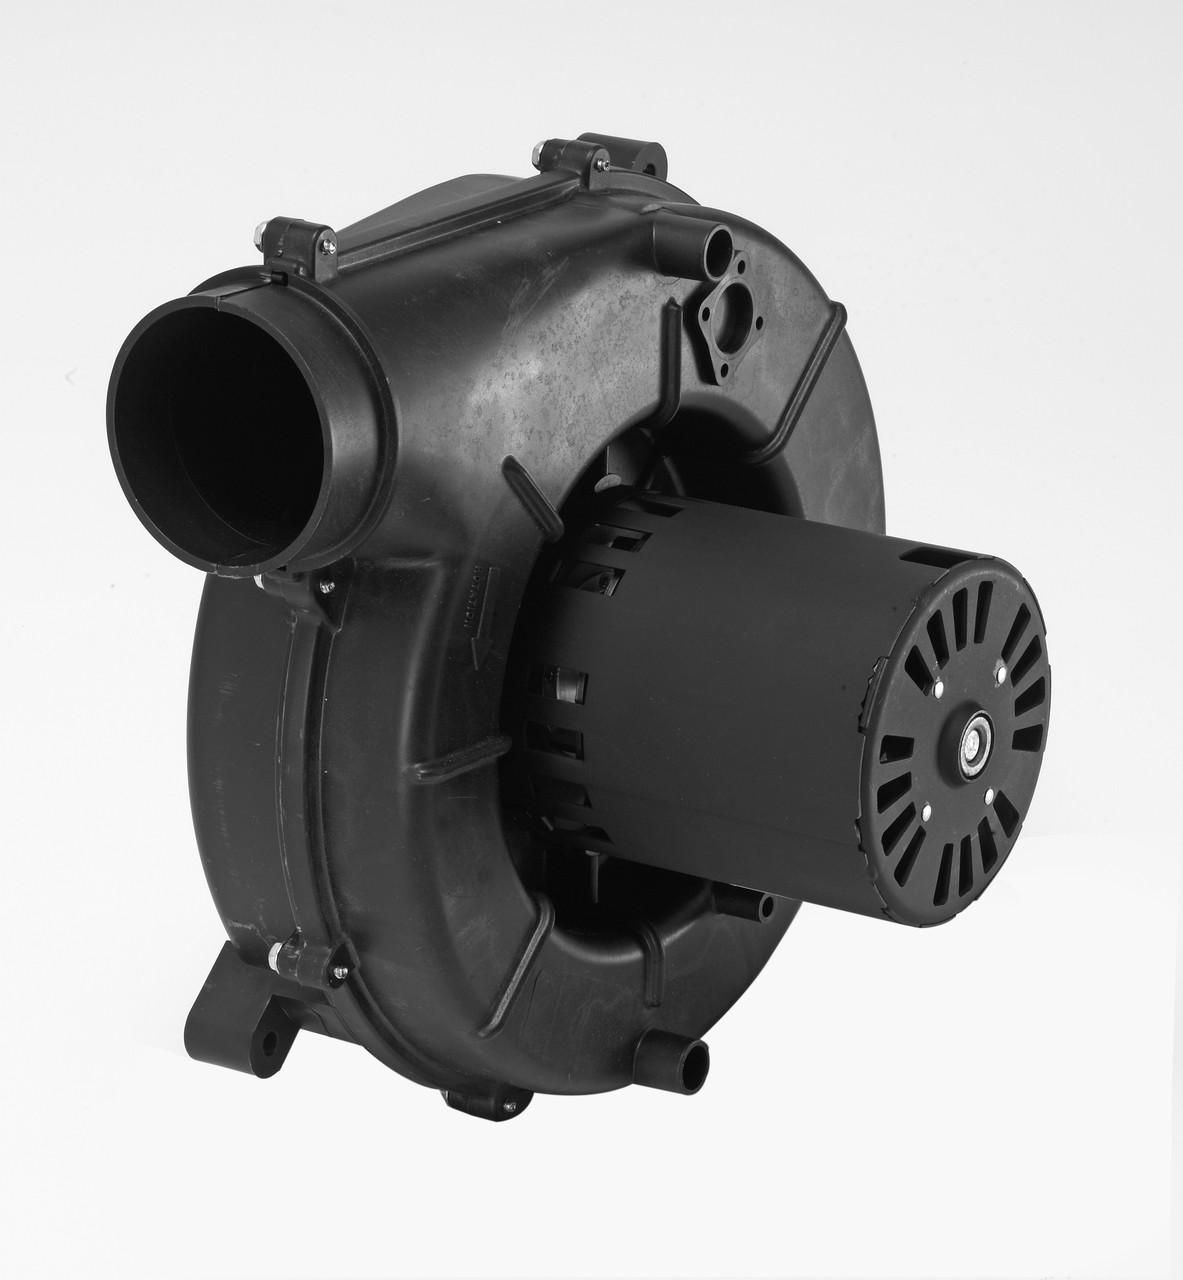 A242__92242.1435072224.1280.1280?c=2 rheem rudd furnace blower motors furnace draft inducers venter rgph-05eauer wiring diagram at reclaimingppi.co